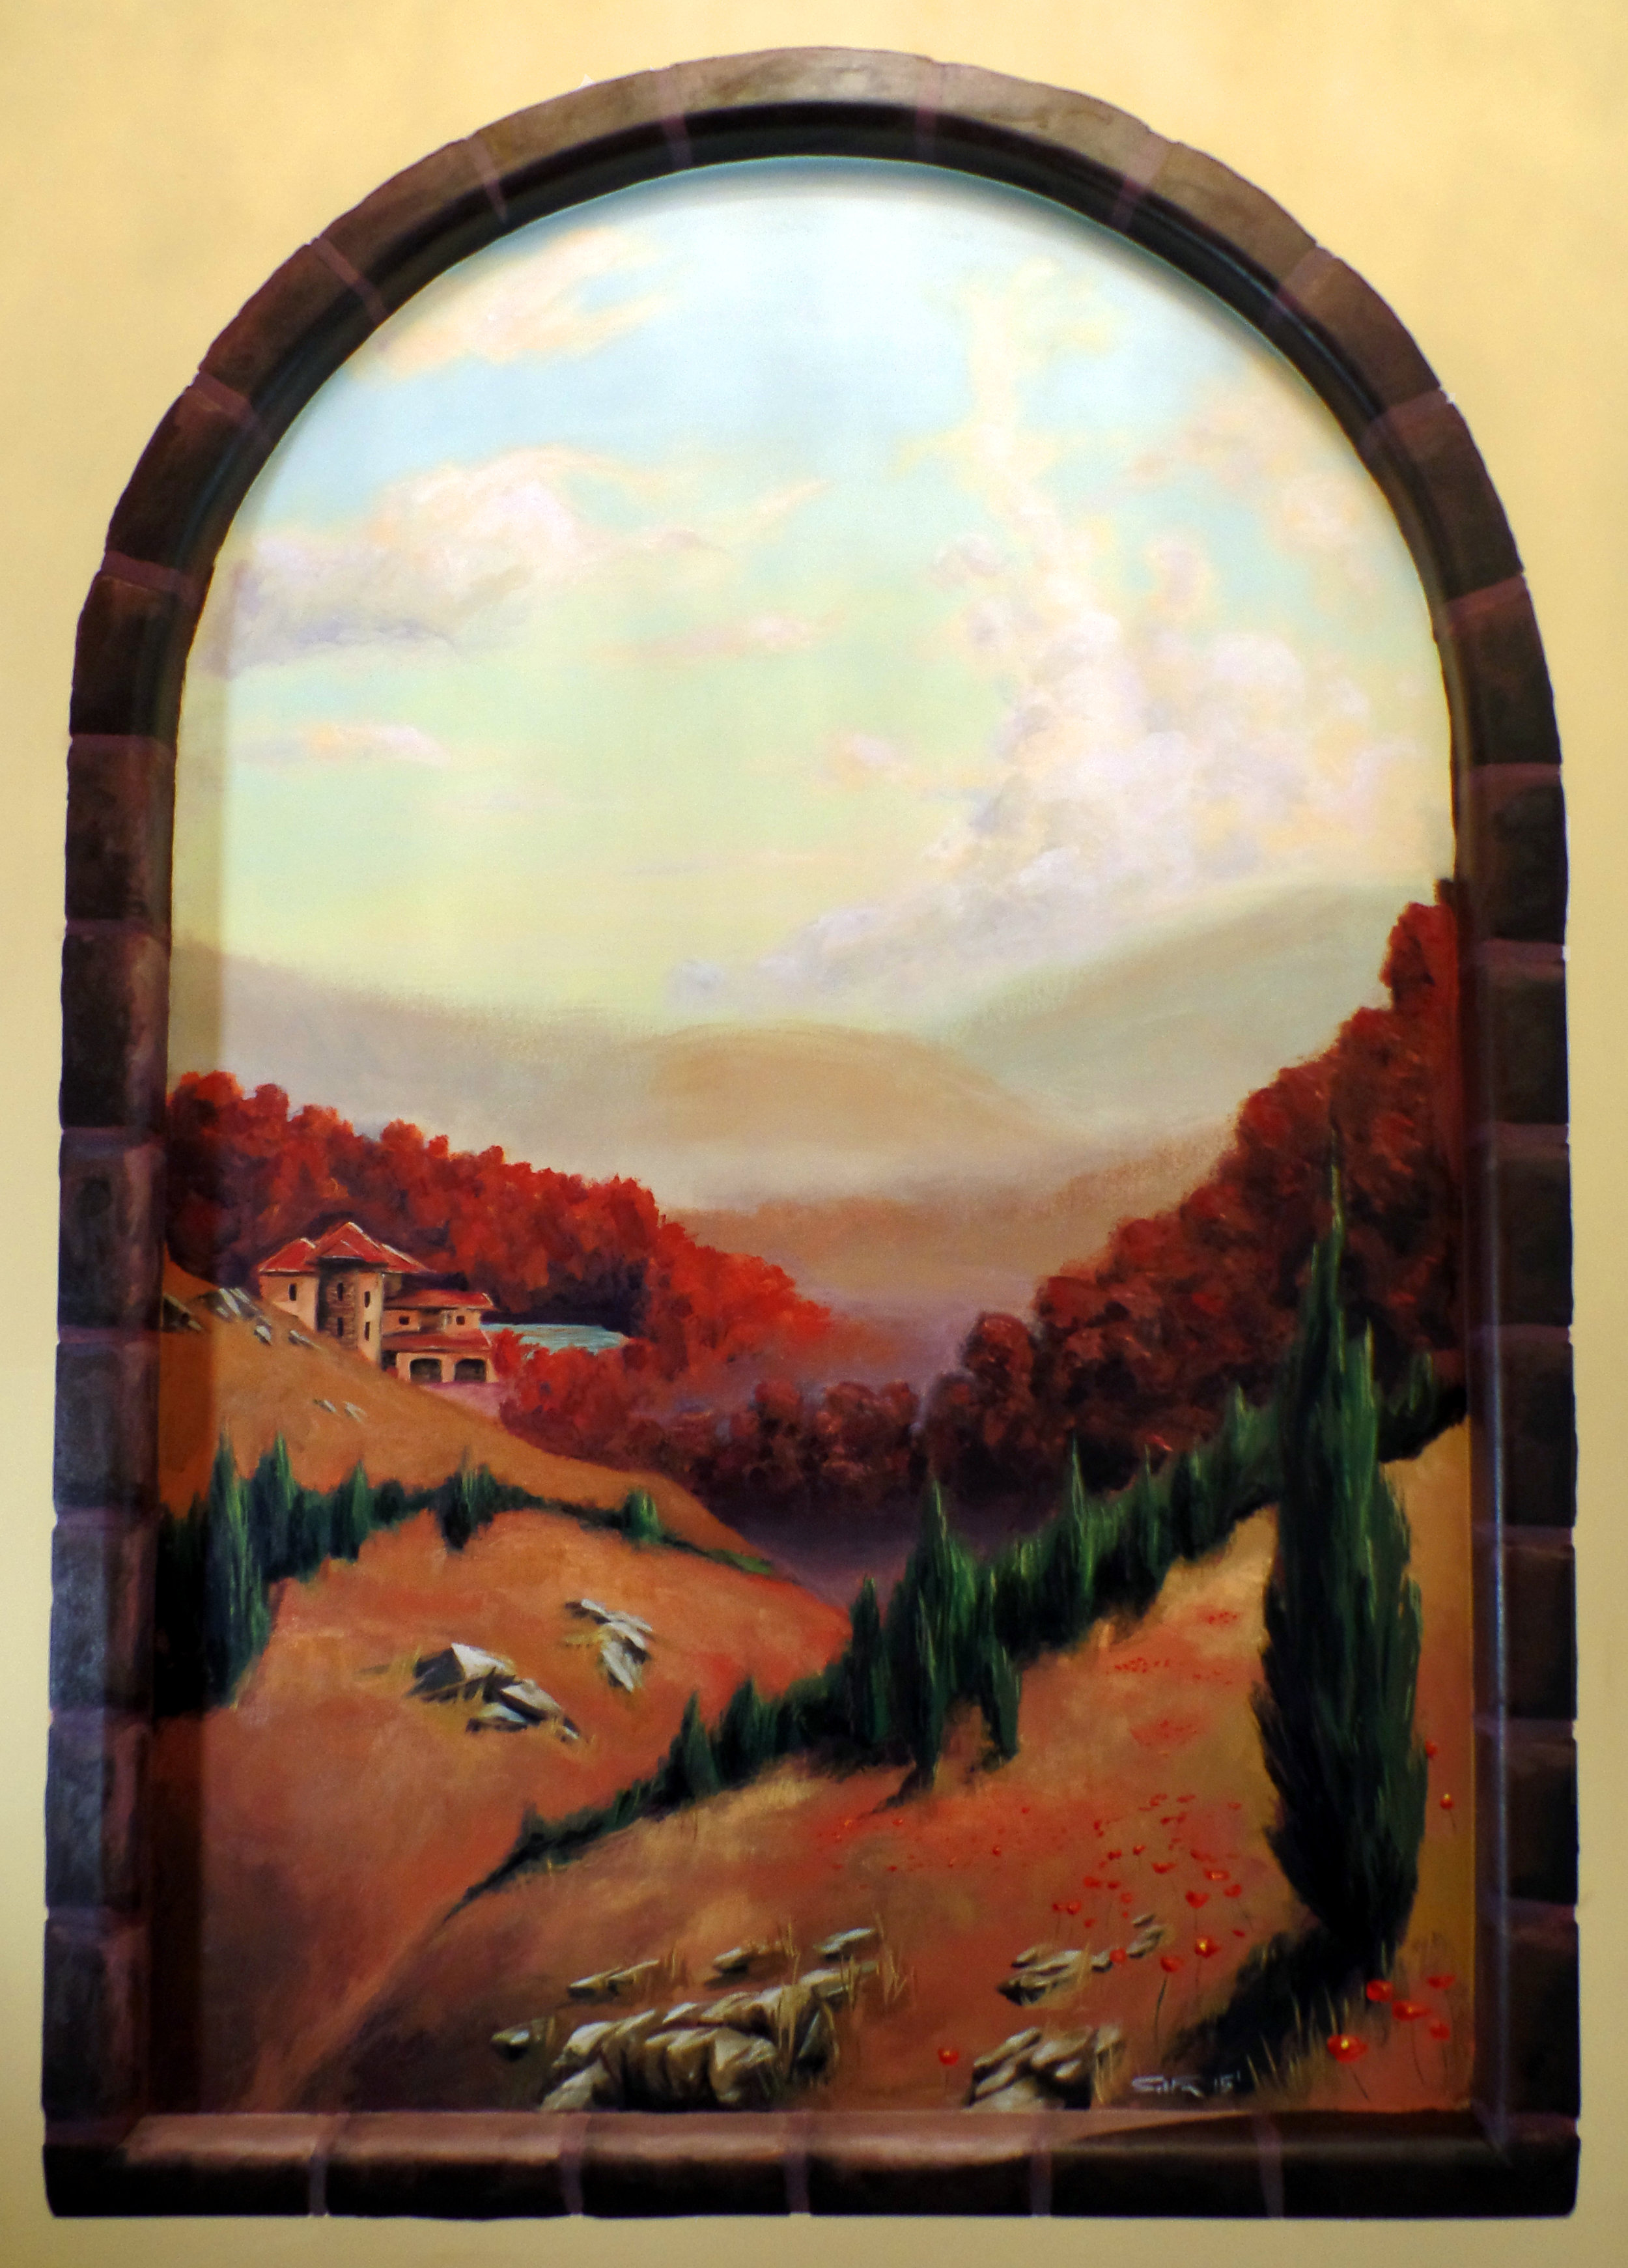 Tuscan Wall Mural 3' by 5'.jpg